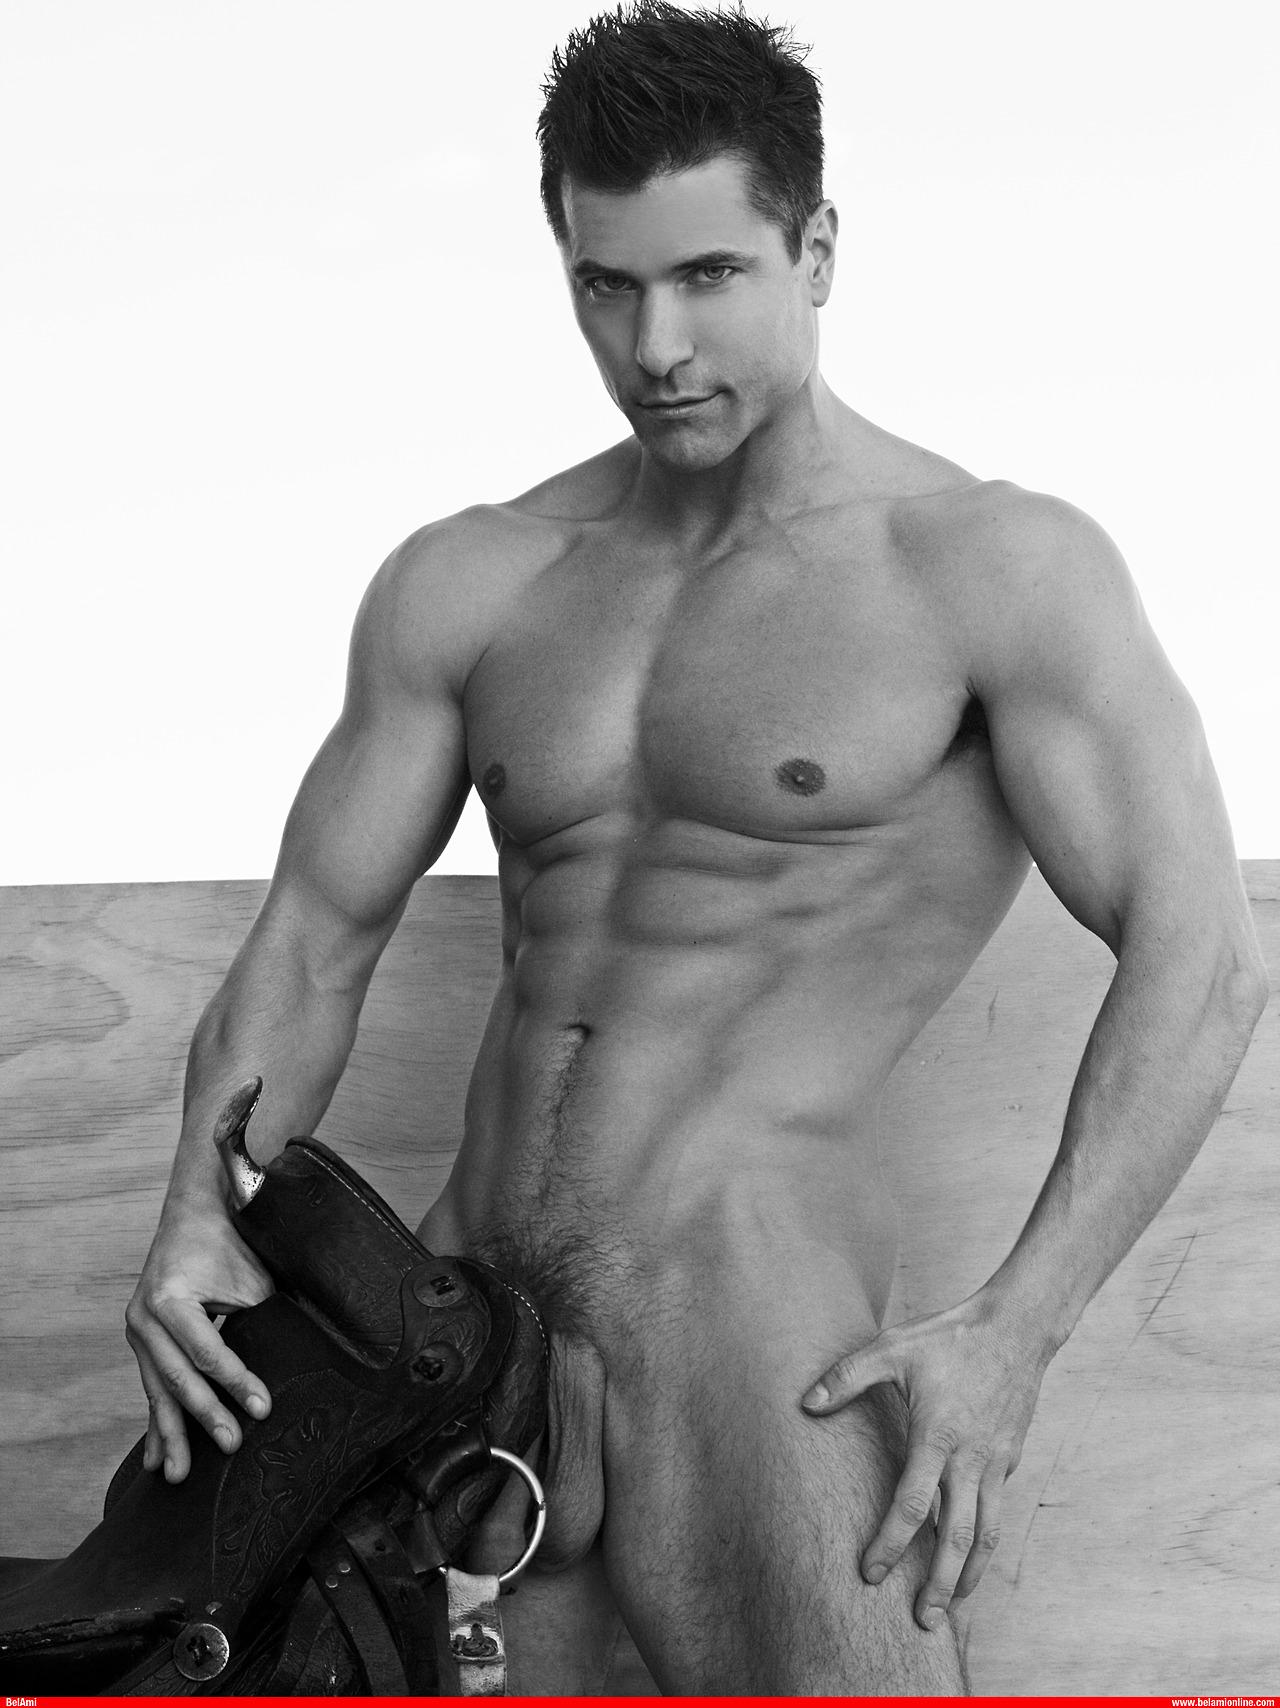 Lukas Ridgeston - We Love Nudes